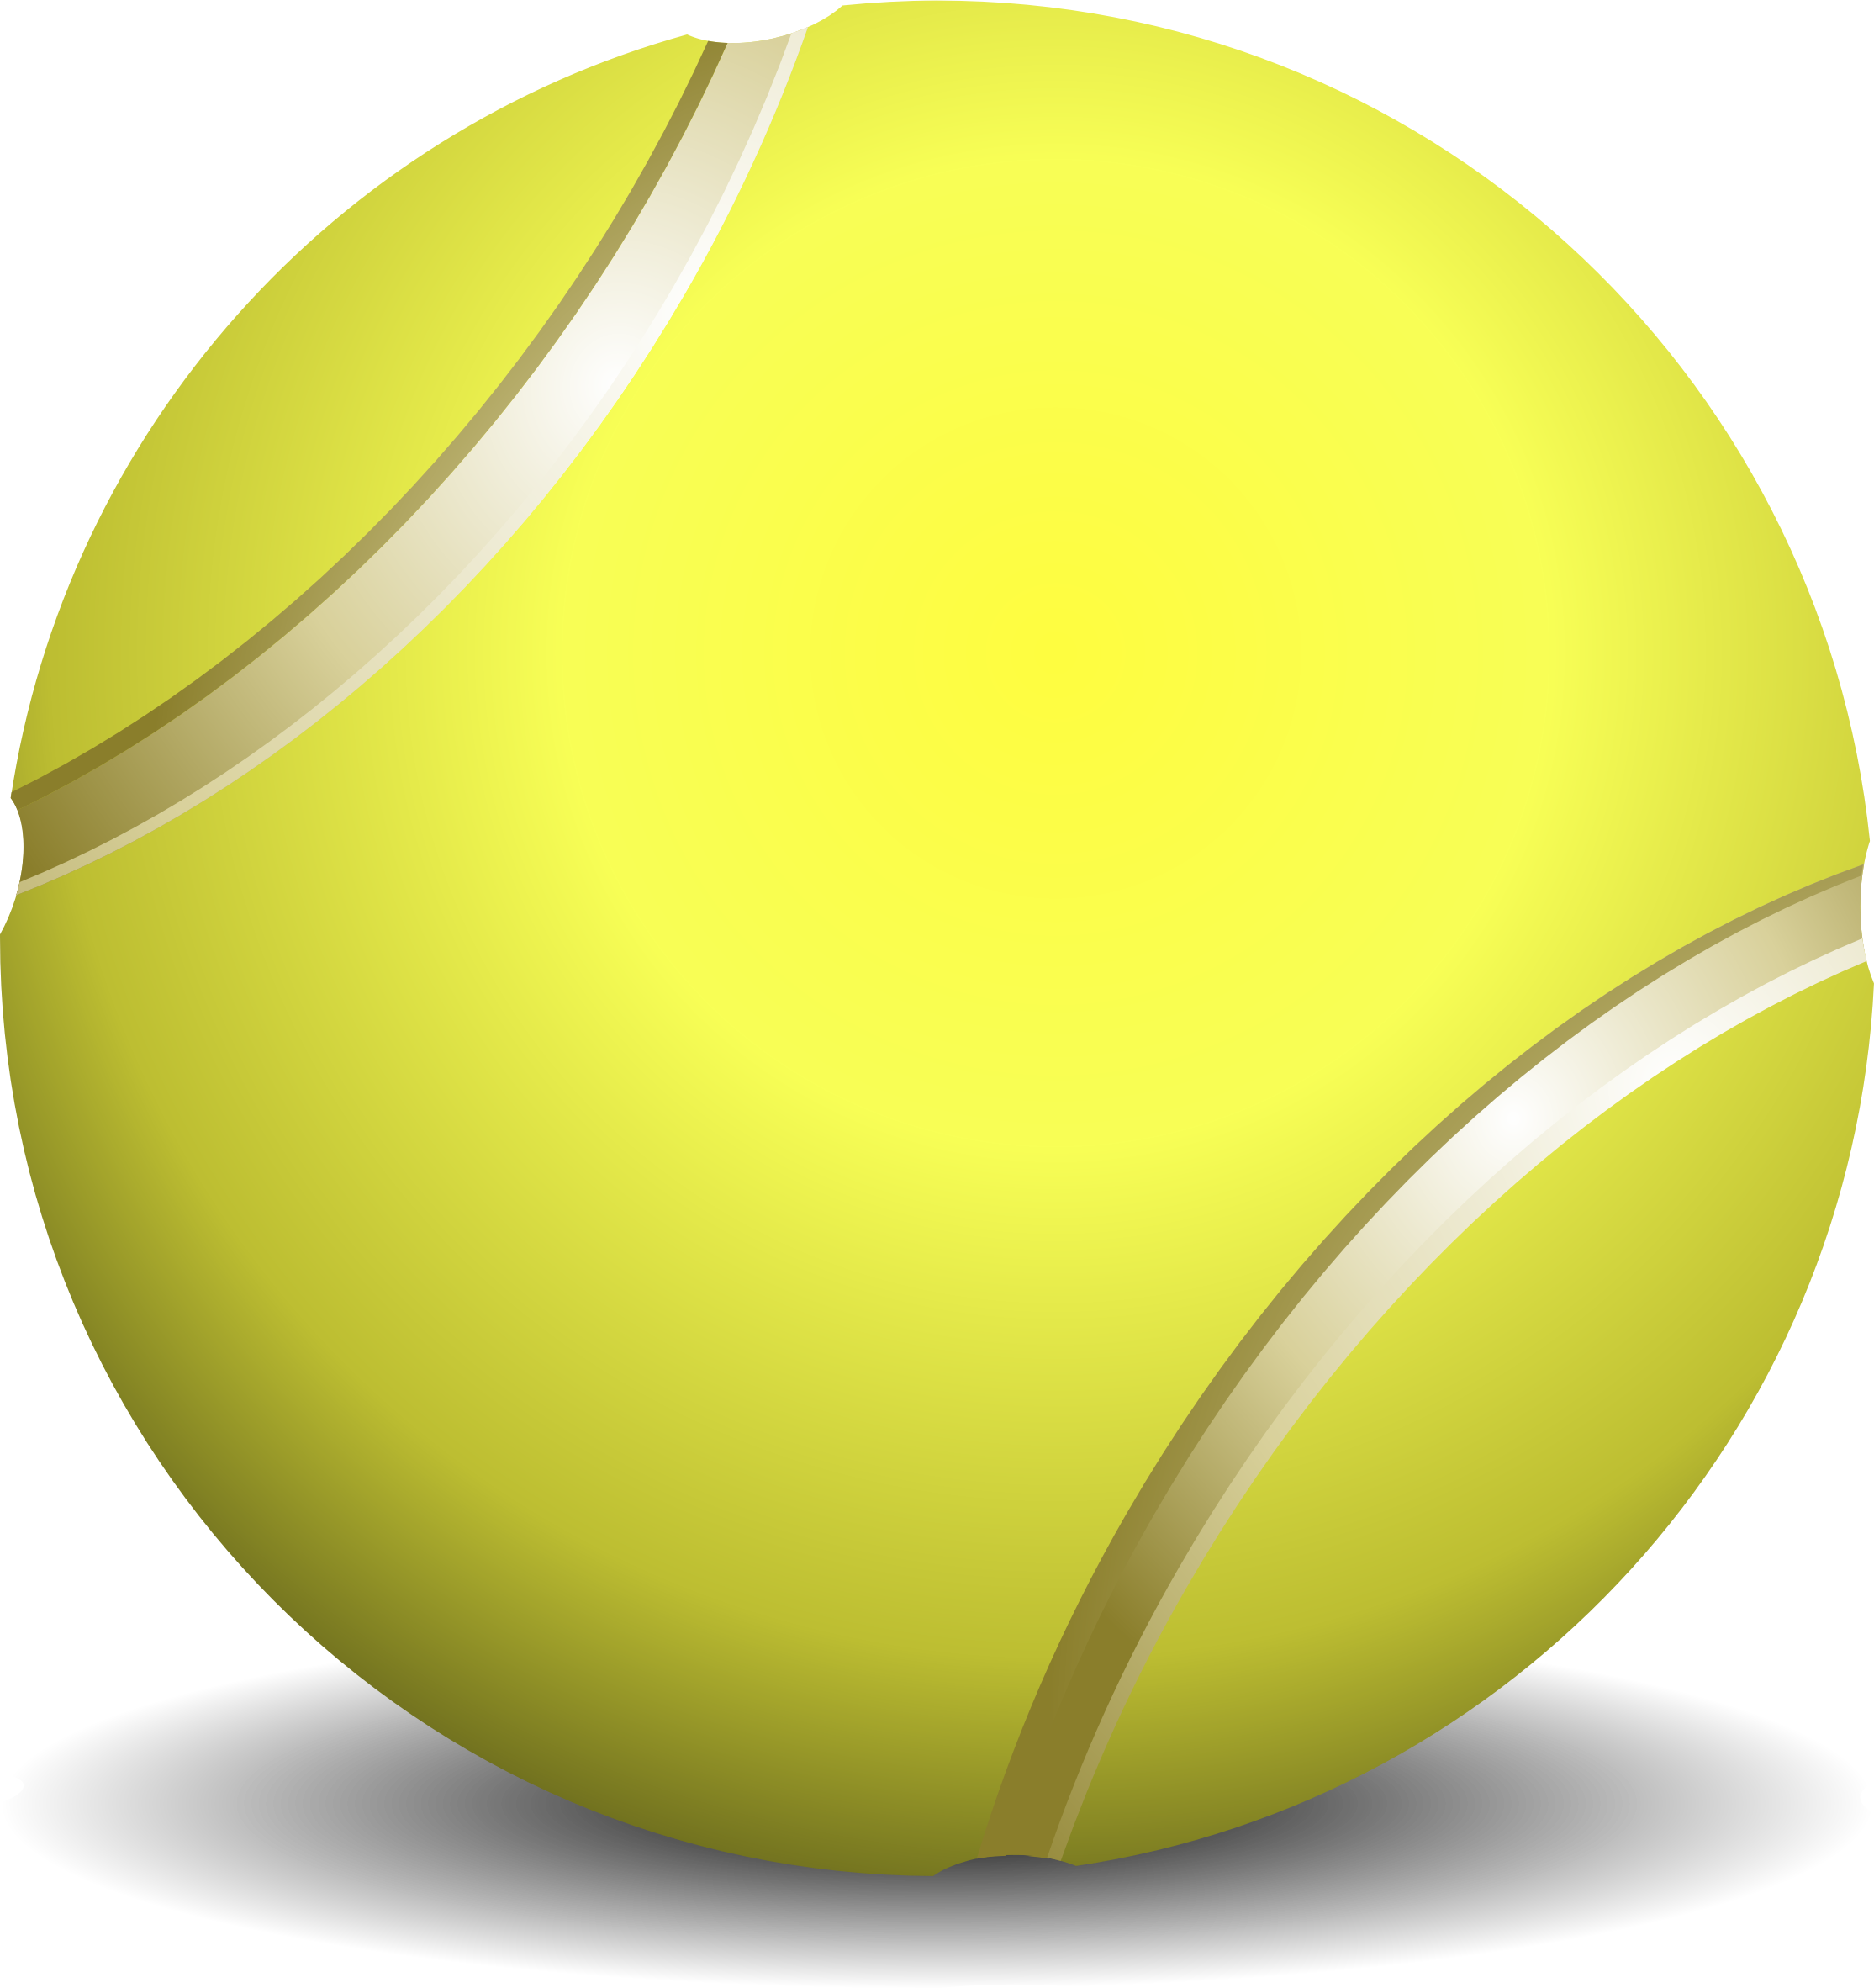 Clipart Tennis Ball Teniso Kamuoliukas-Clipart tennis ball teniso kamuoliukas-3